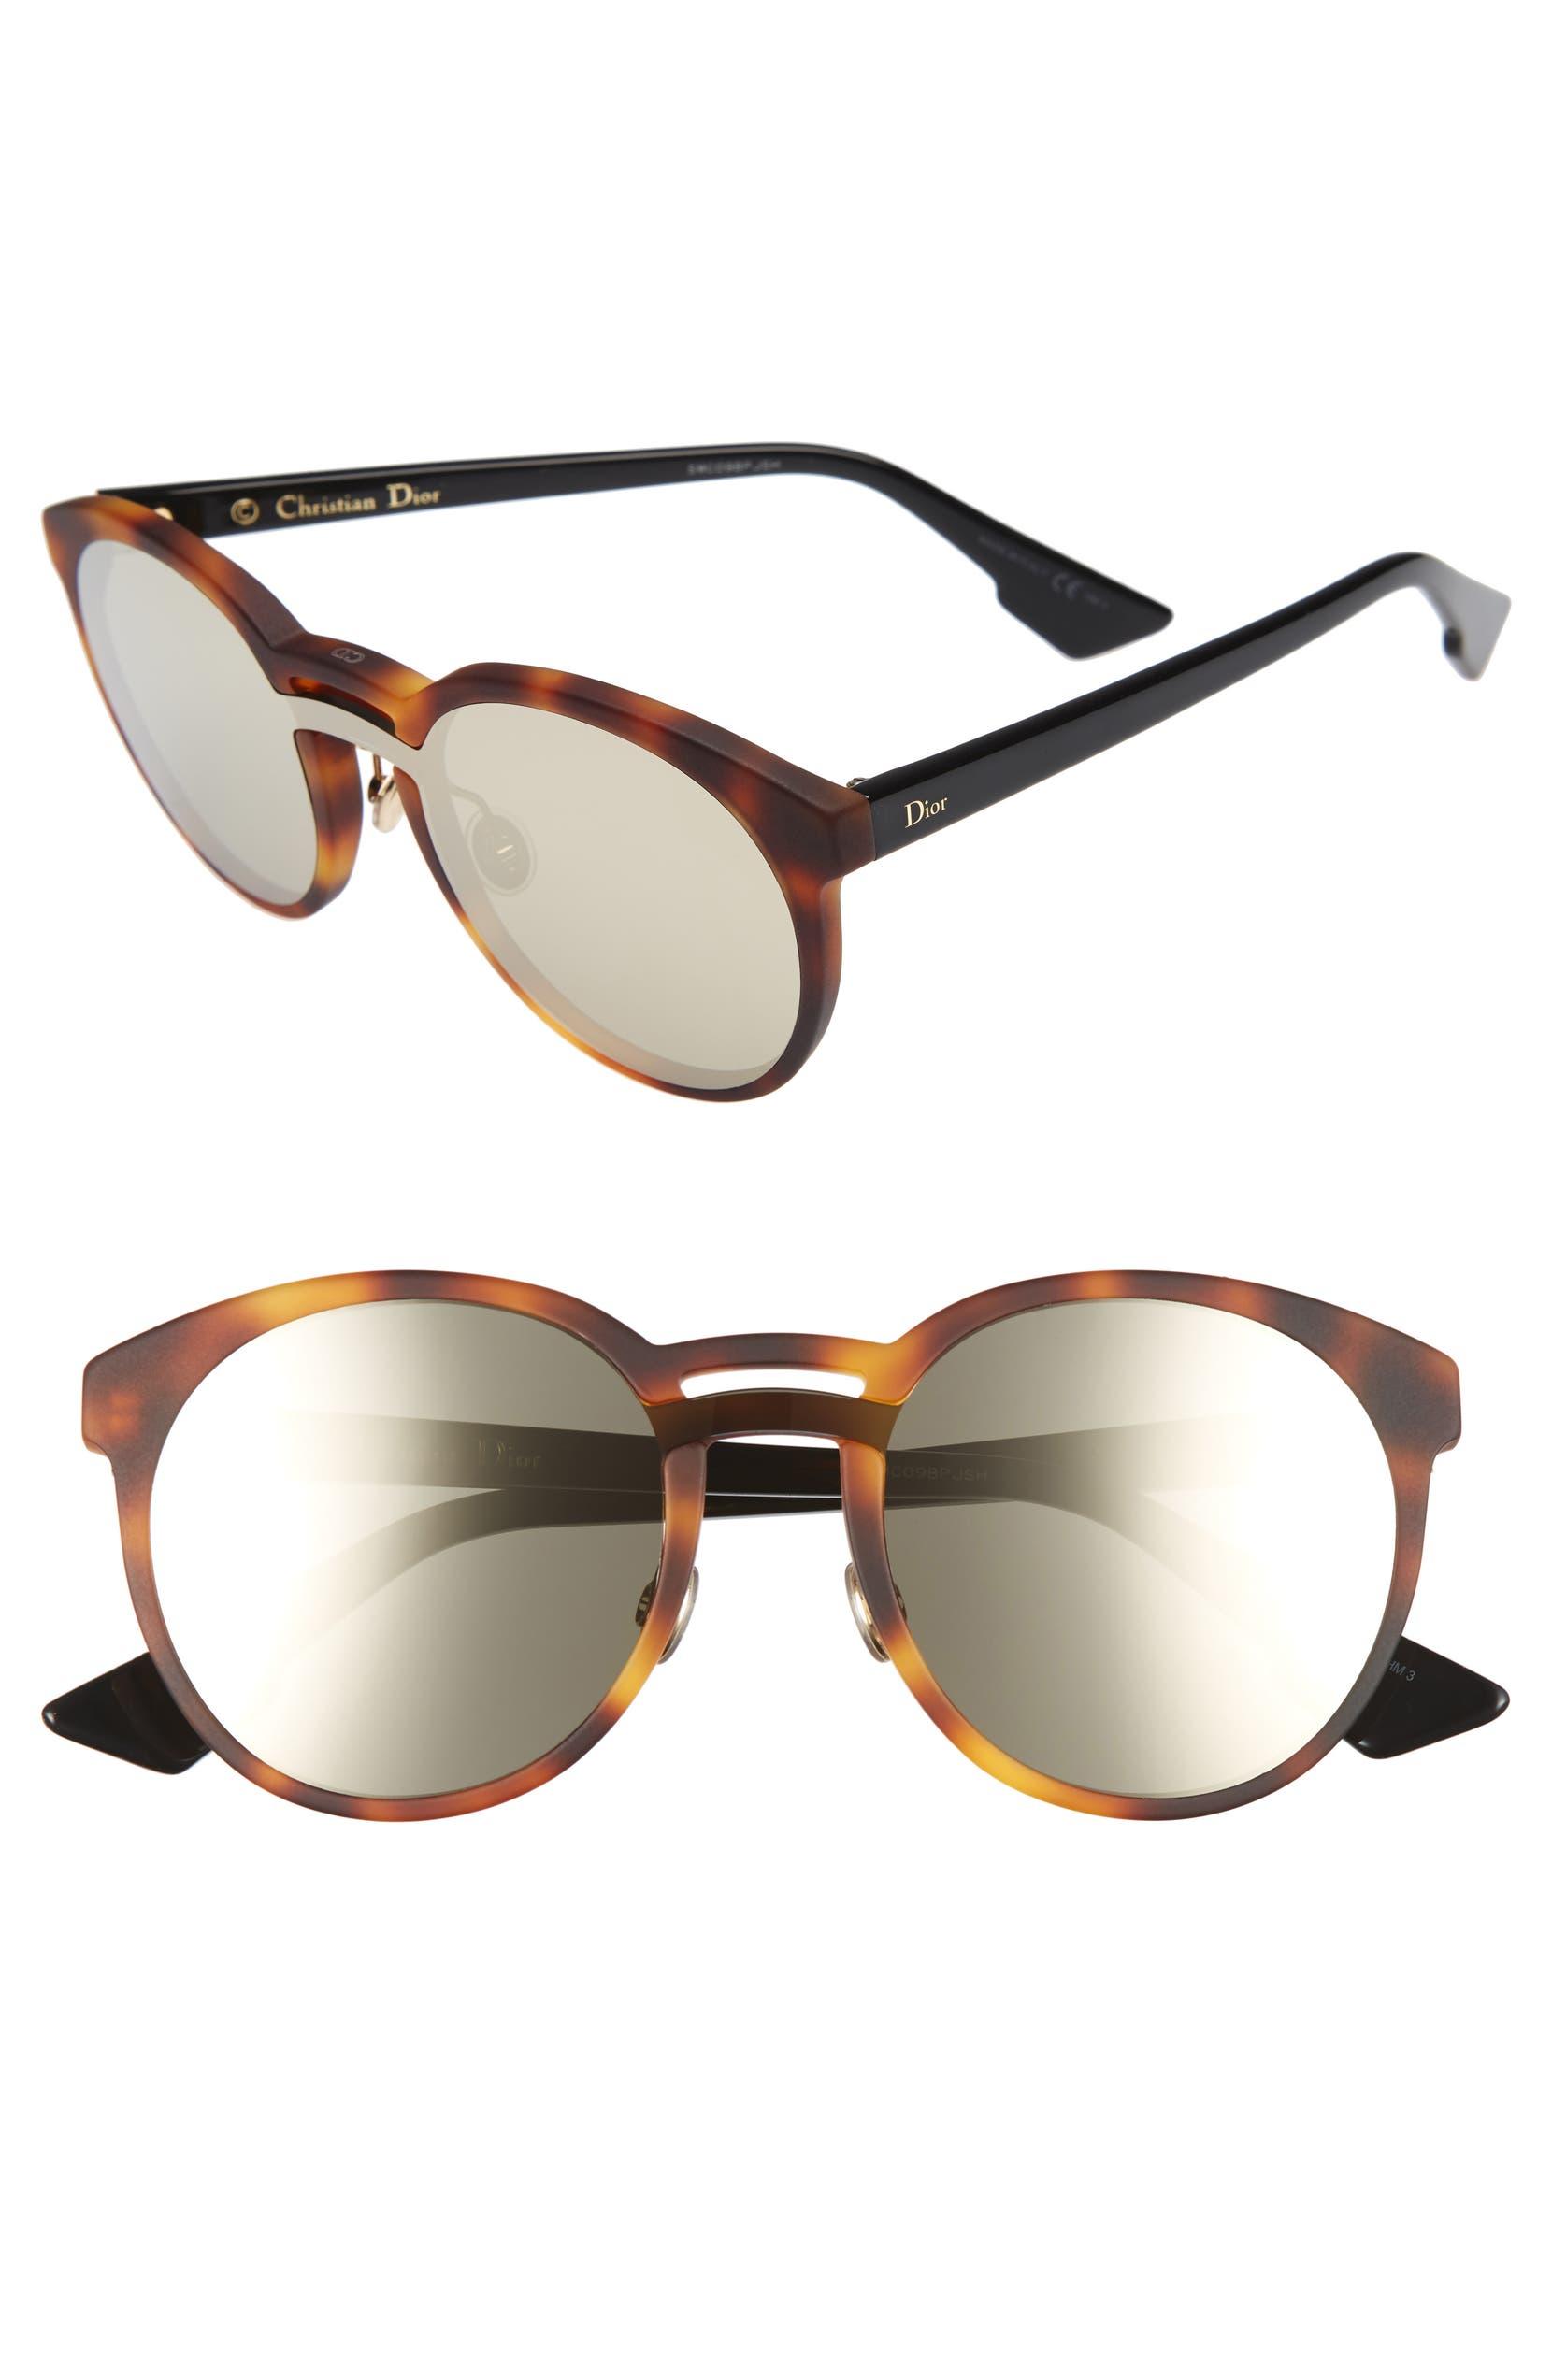 29b8b589485 Dior Onde 1 50mm Round Sunglasses